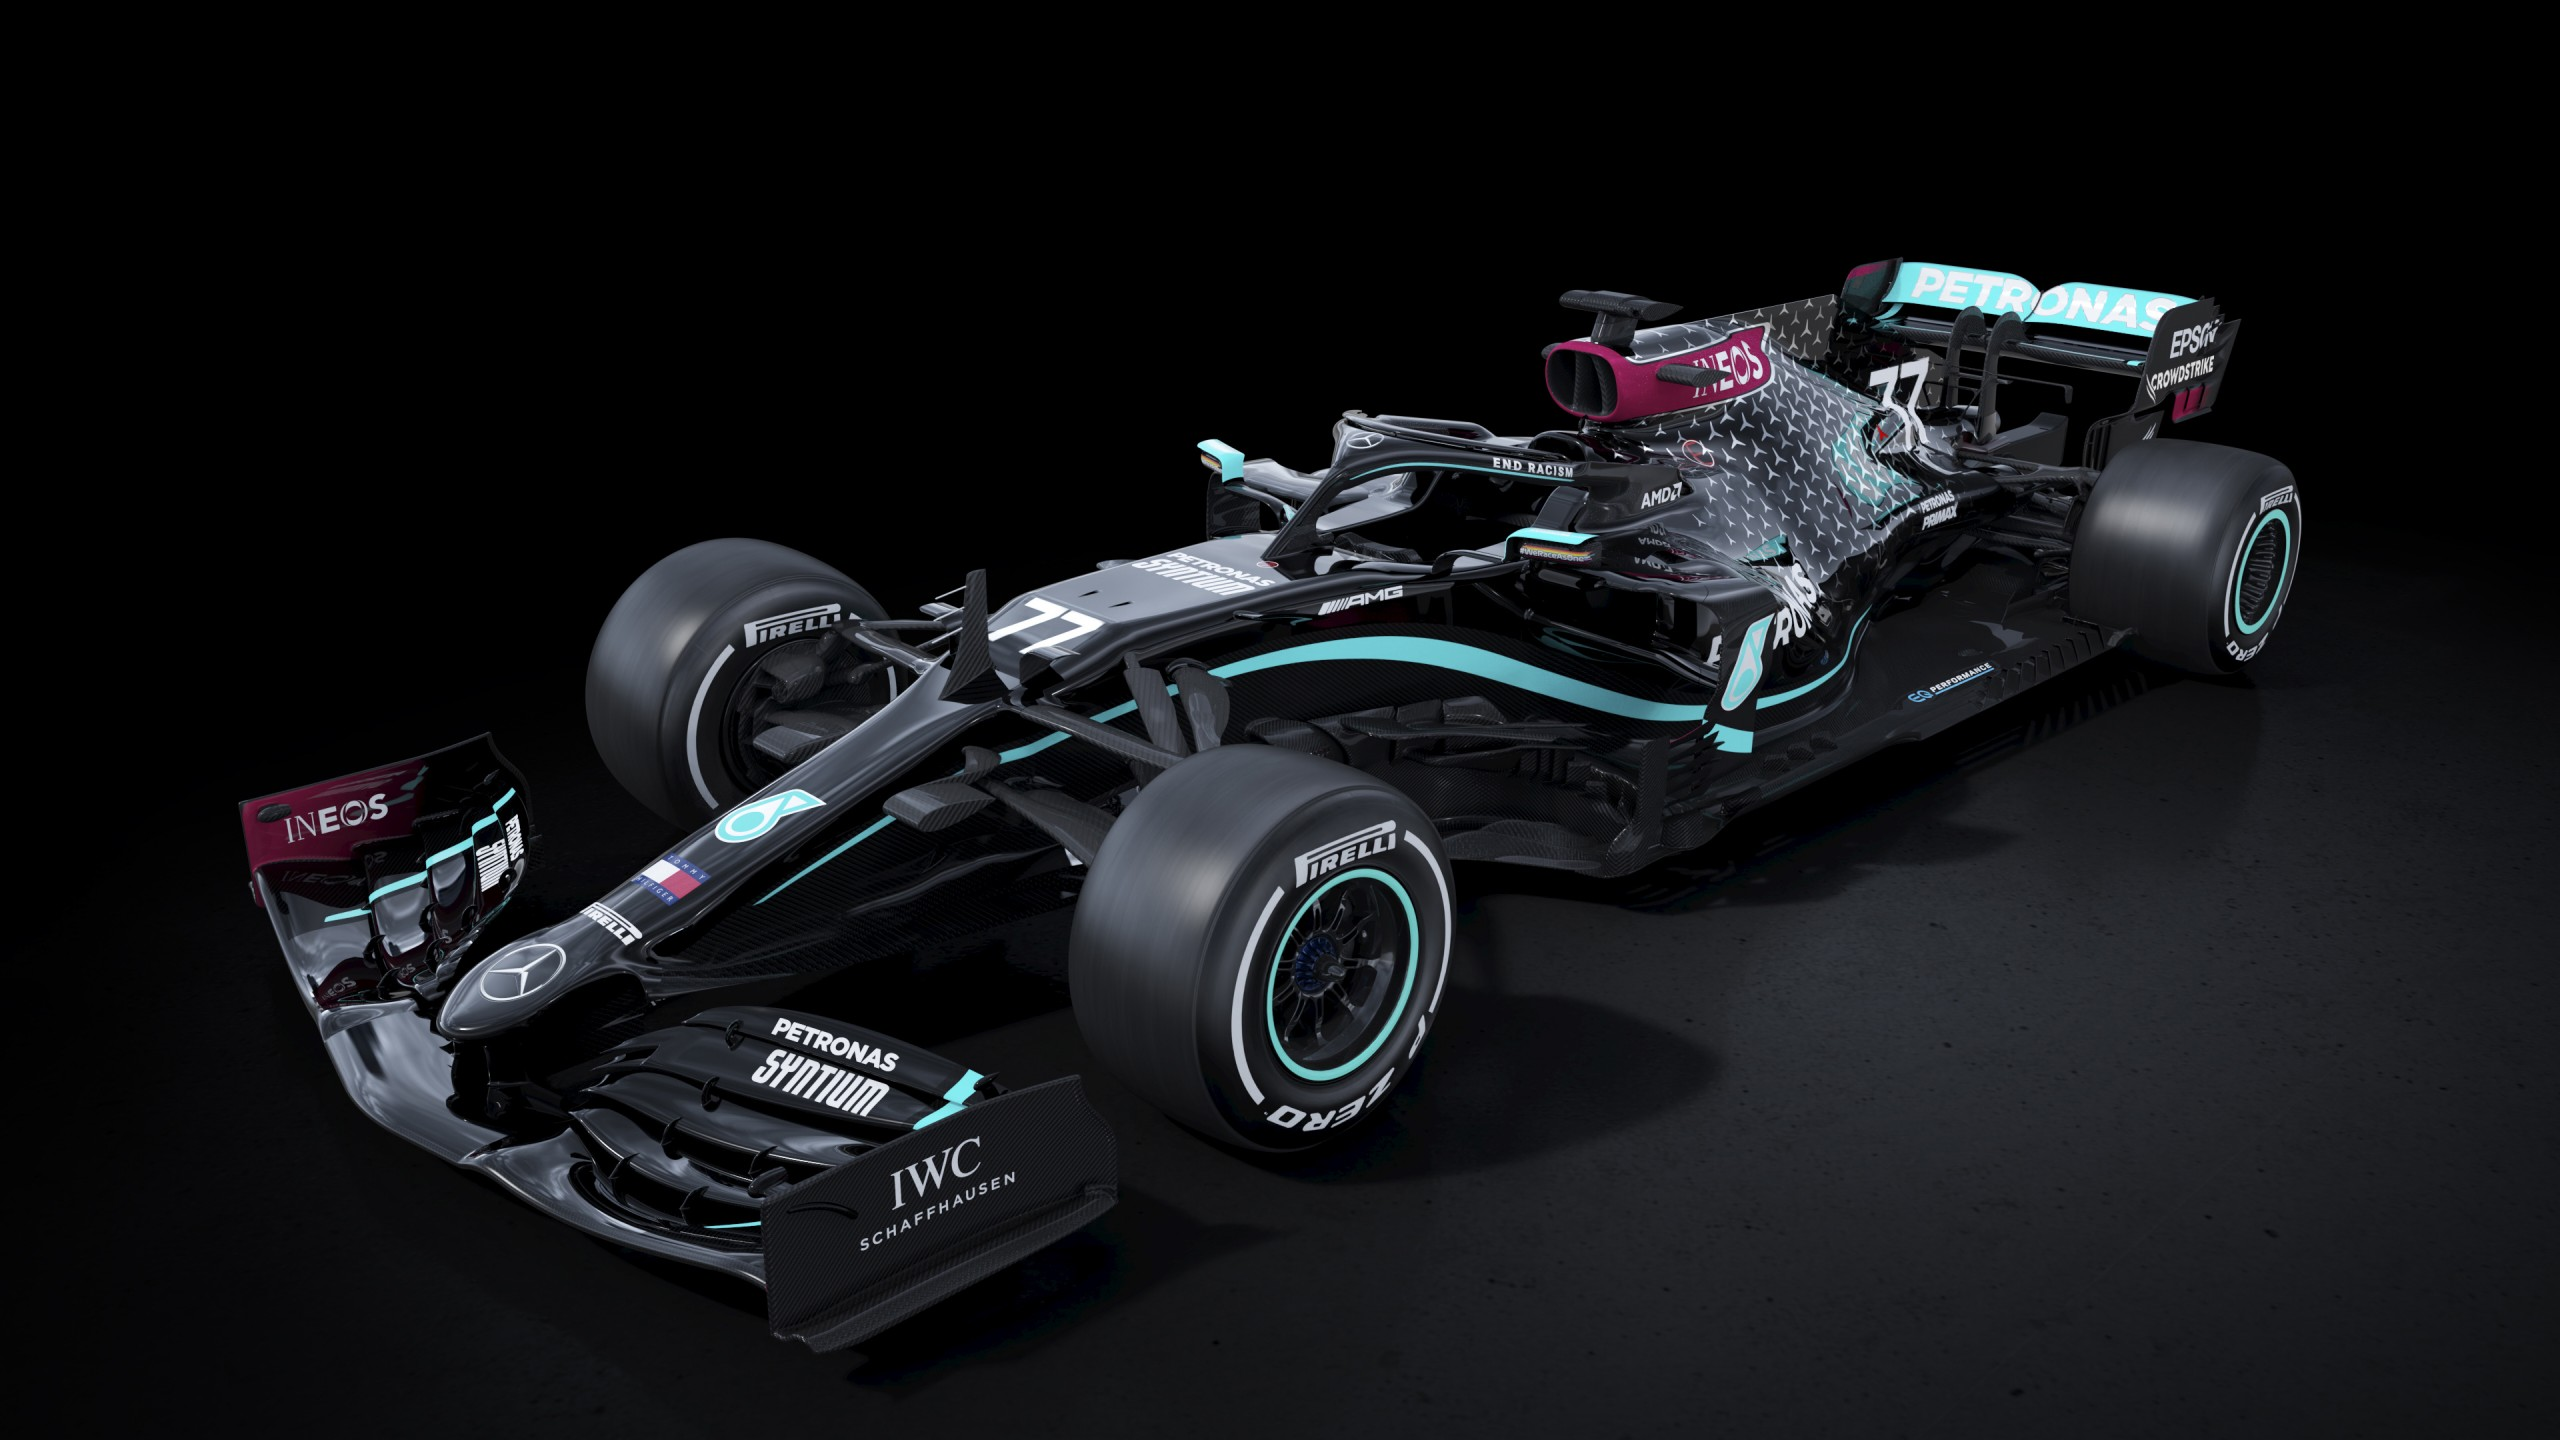 Mercedes AMG F1 W11 EQ Performance 2020 4K 2 Wallpaper HD Car 2560x1440